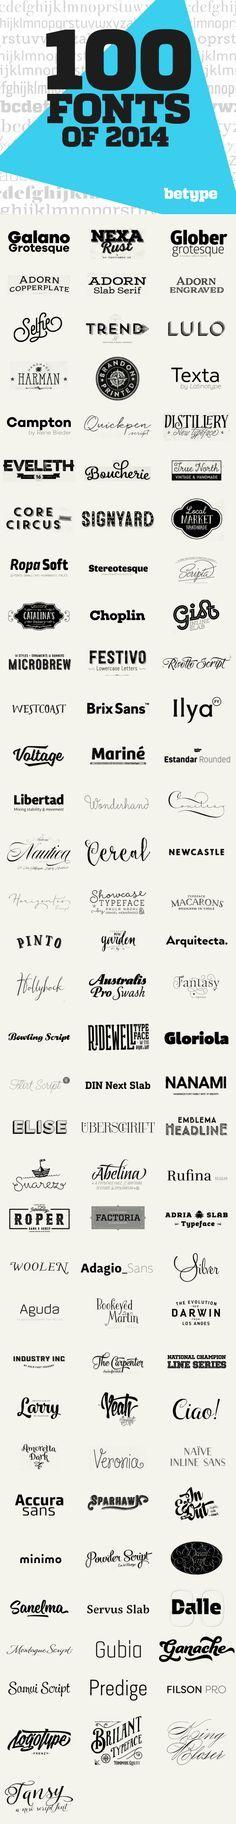 100 Best Fonts of 2014 via http://fontsoftheyear.com